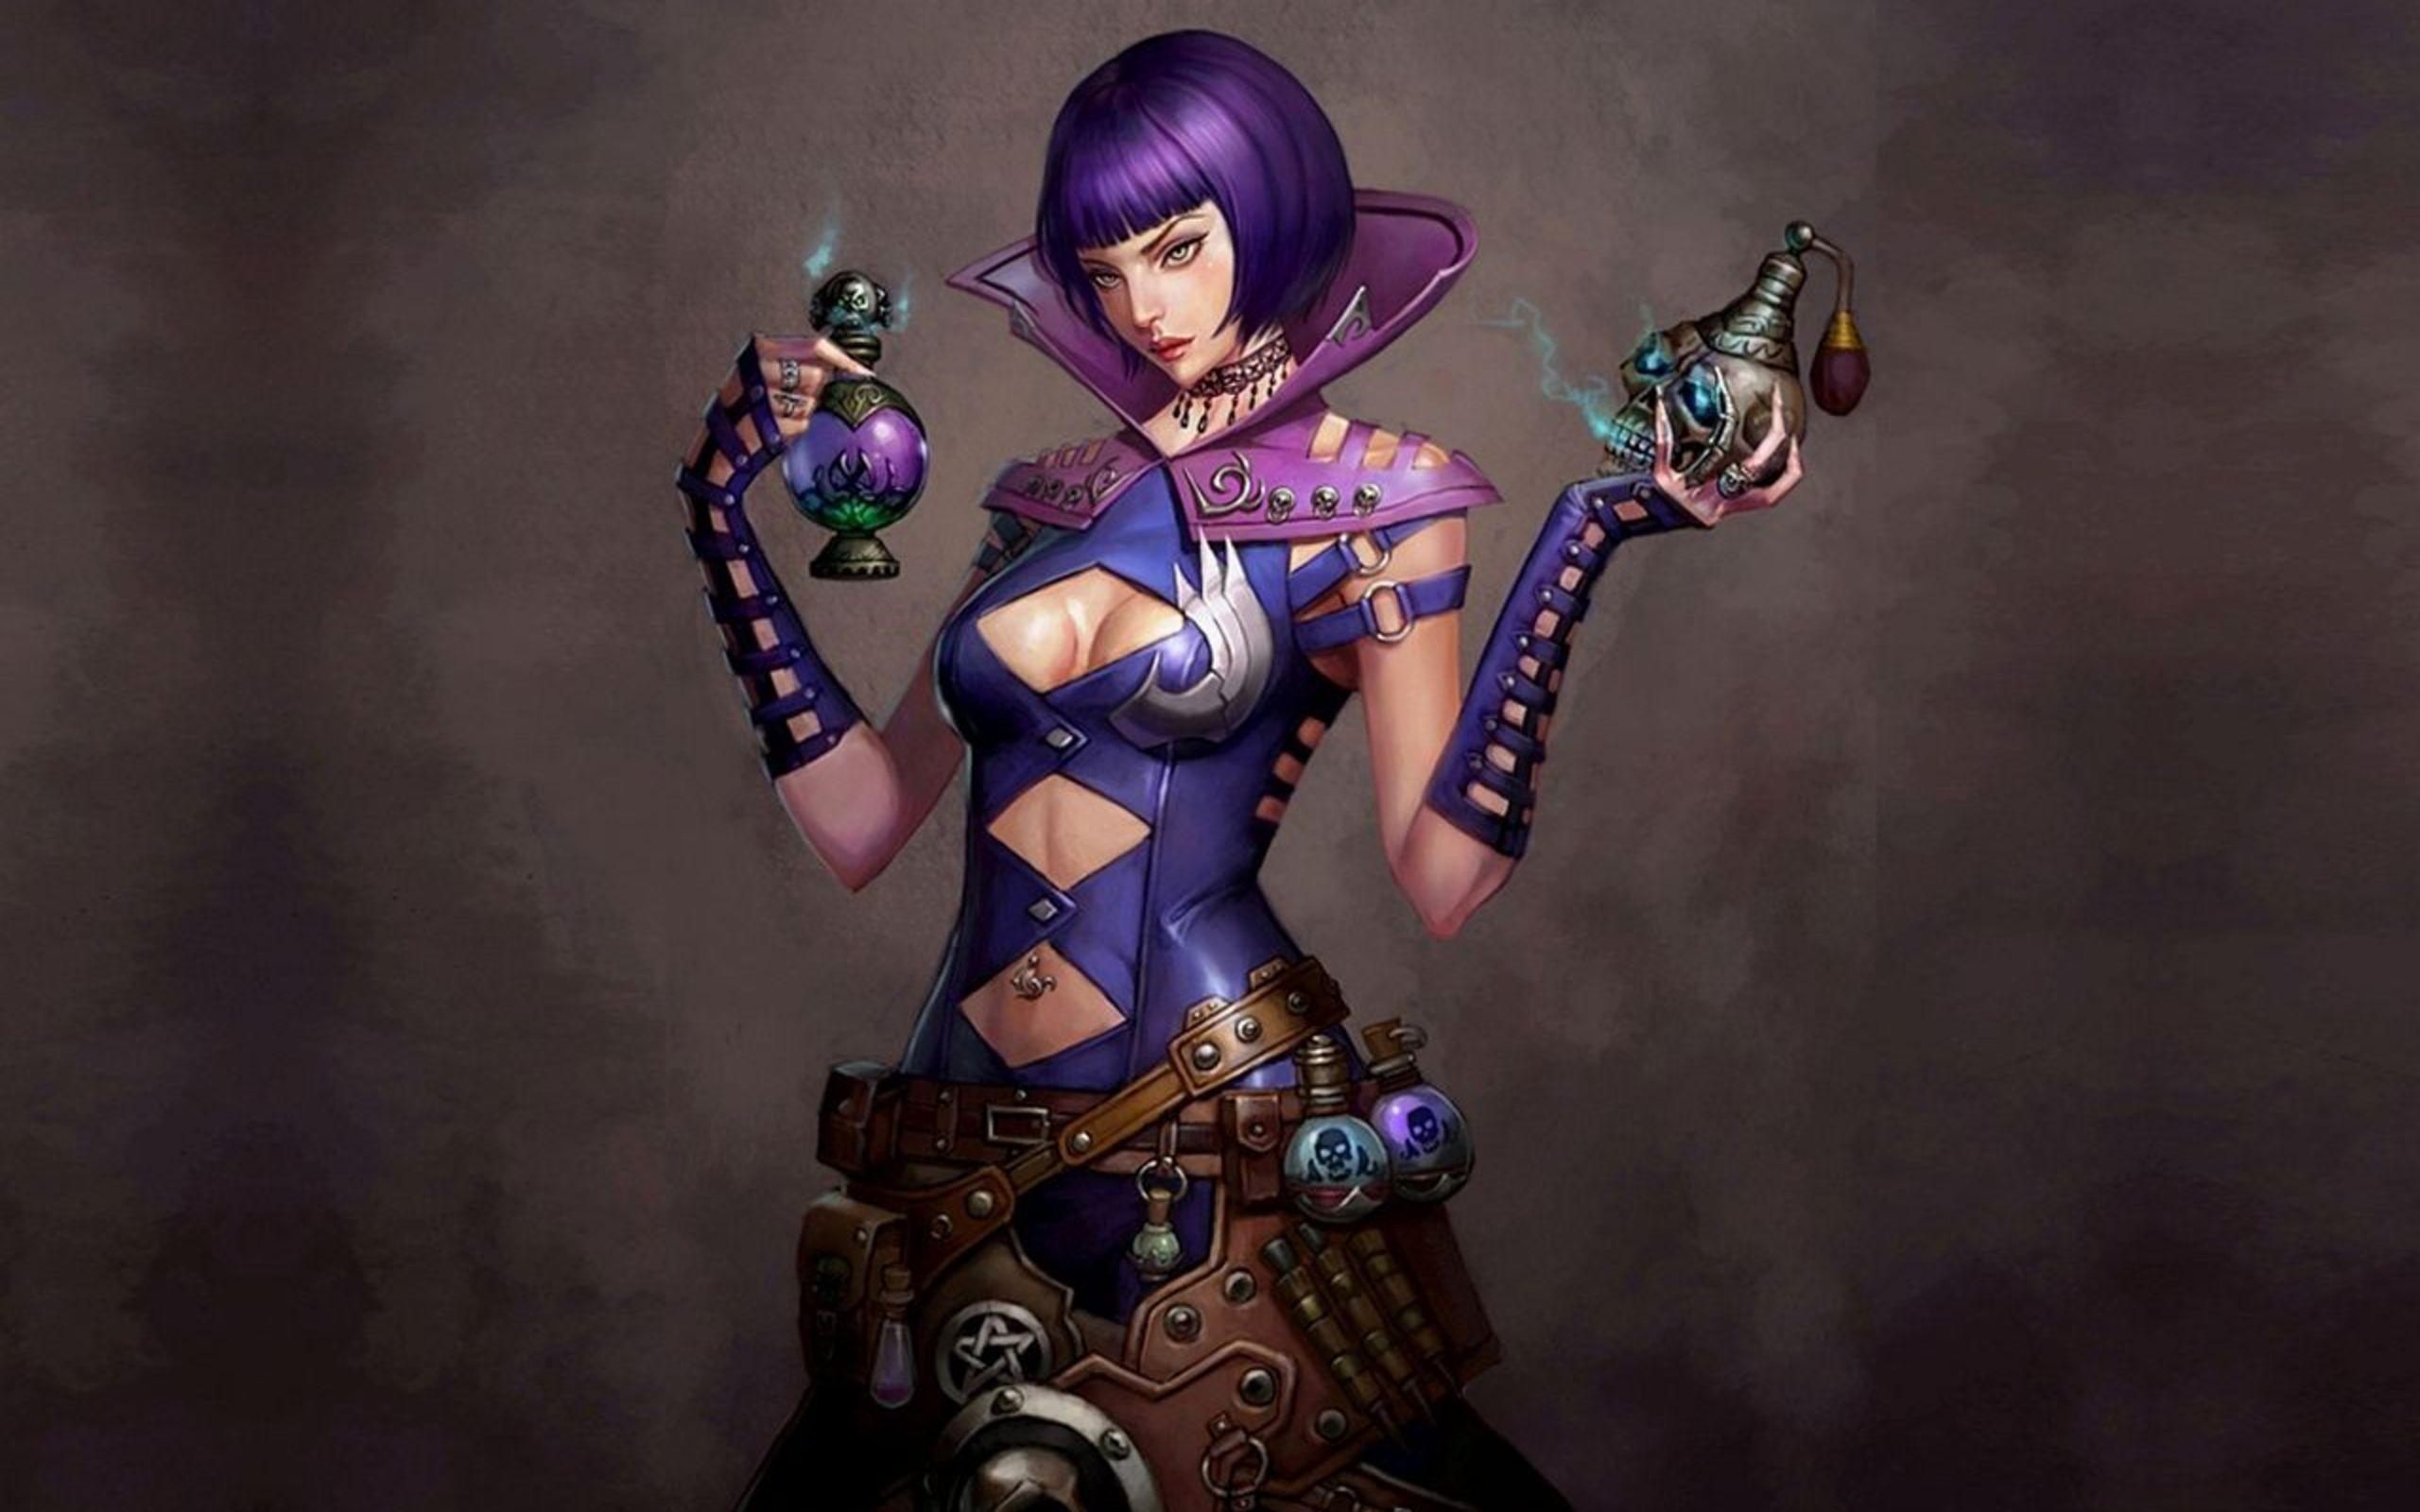 General 2560x1600 women Pathfinder video games fantasy girl fantasy art boobs video game girls purple hair standing artwork